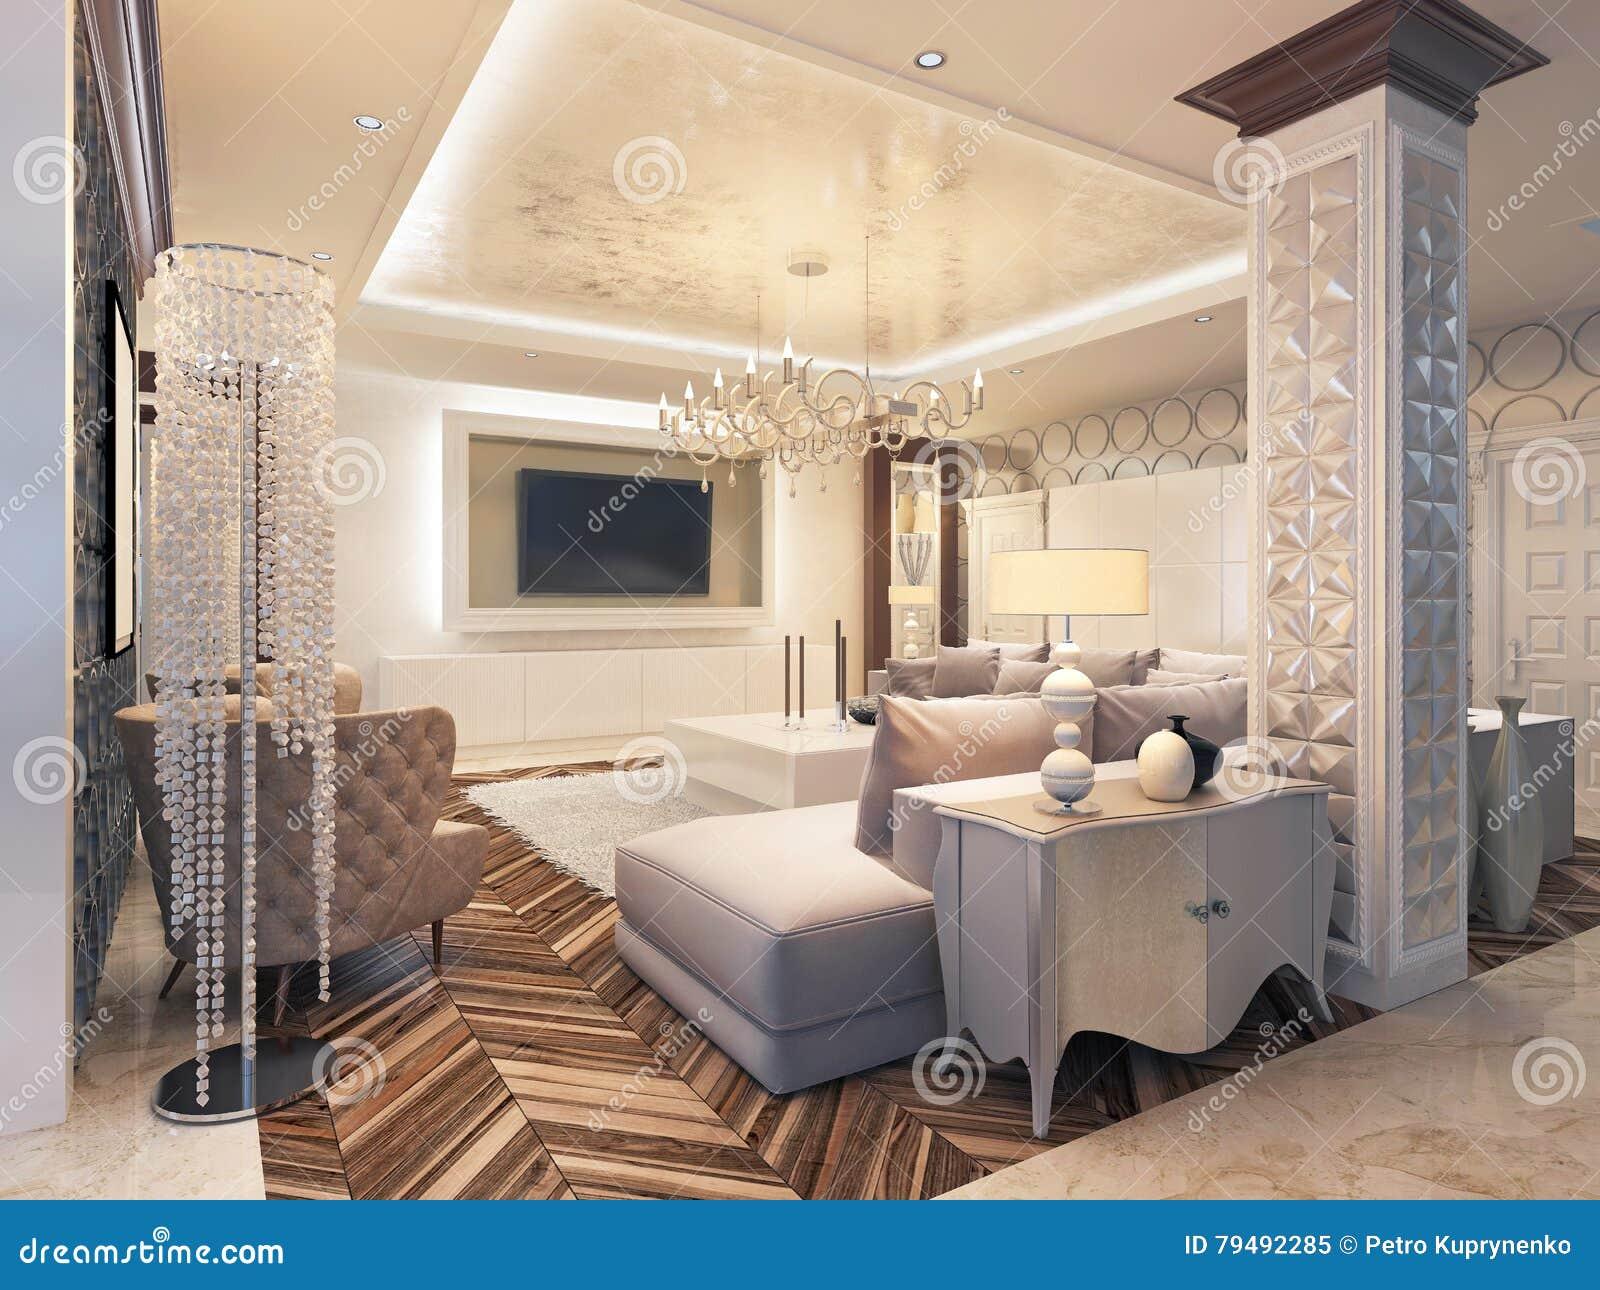 Koraalkleur De Woonkamer : Moderne woonkamer in witte kleuren met geïntegreerde opslag voor t